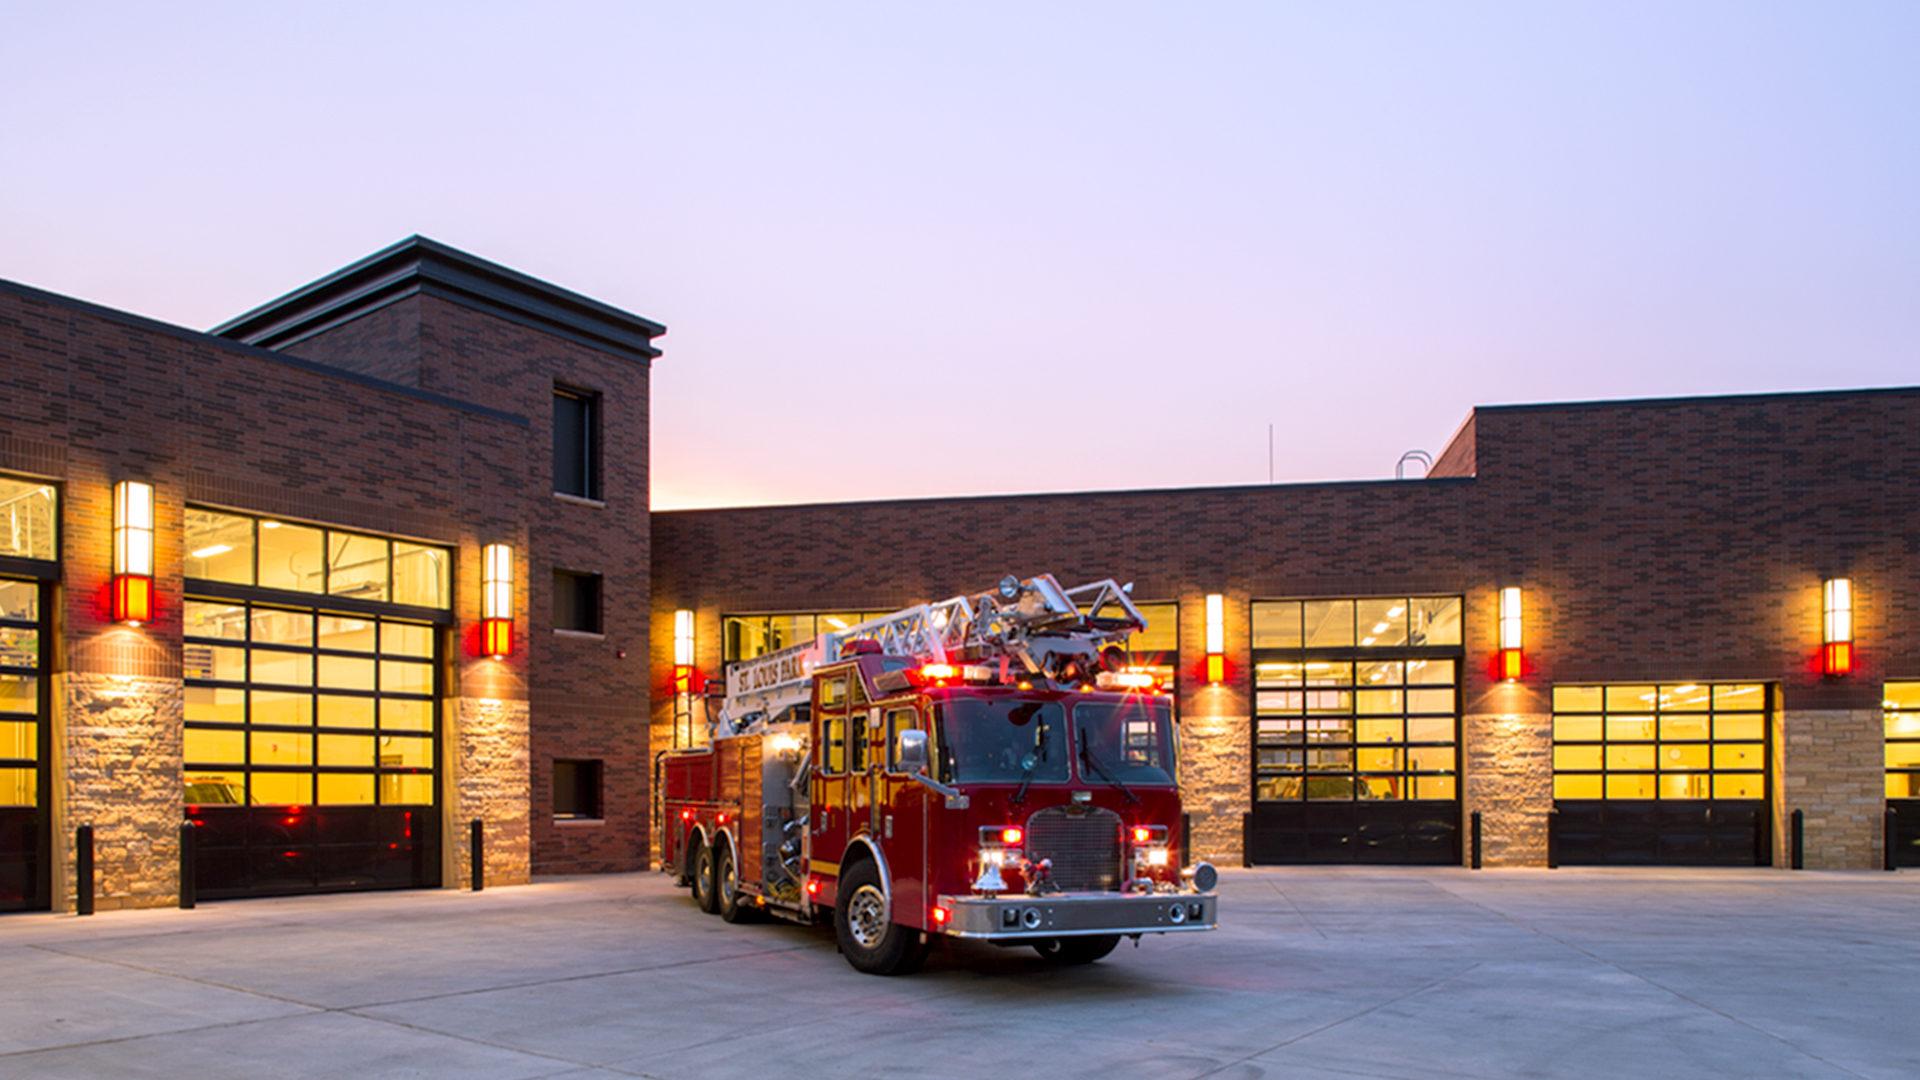 St Louis Park Fire Station 1 St Louis Park MN Fire Trucks Parked Outside Garage